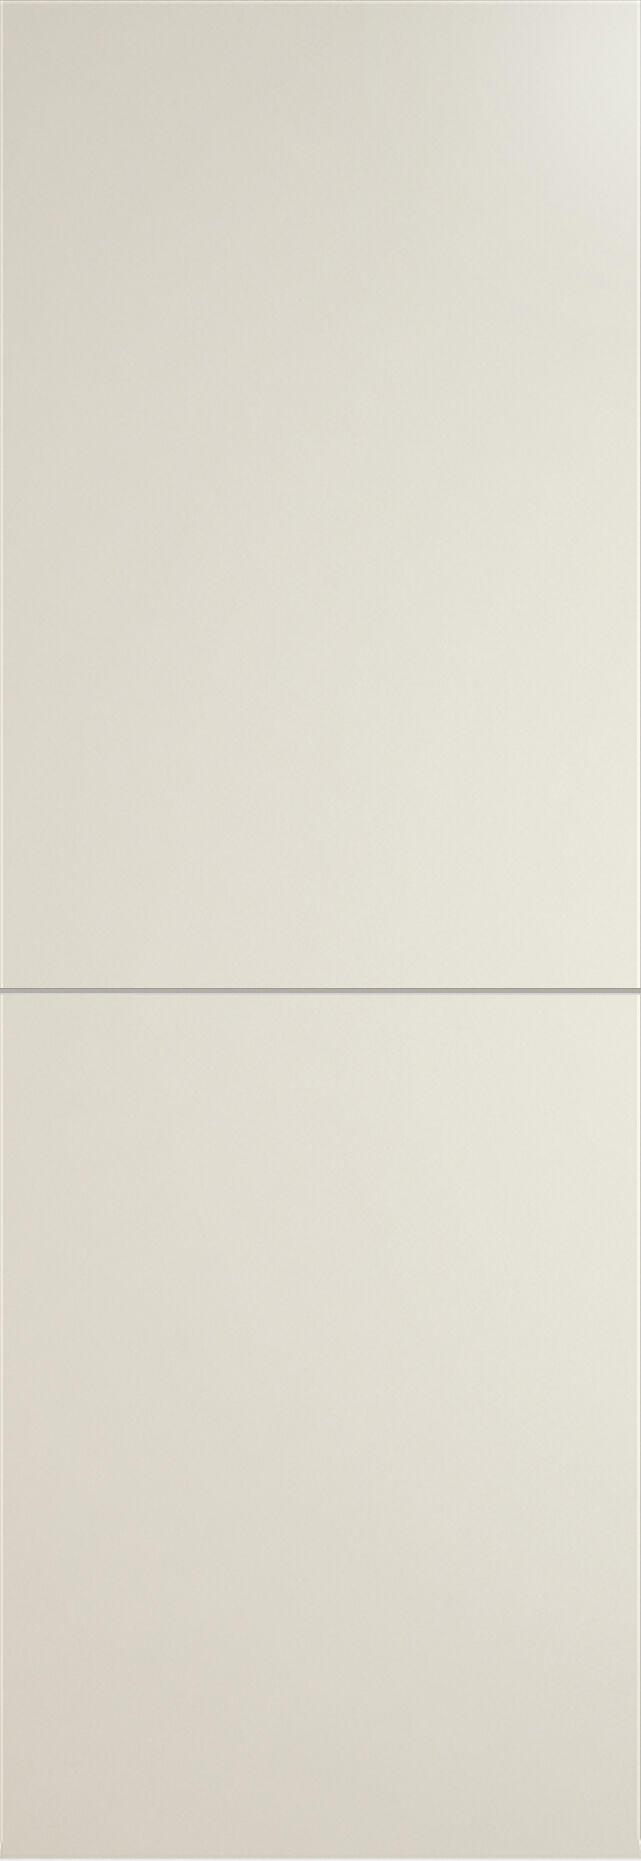 Tivoli Б-2 Invisible цвет - Жемчужная эмаль Без стекла (ДГ)